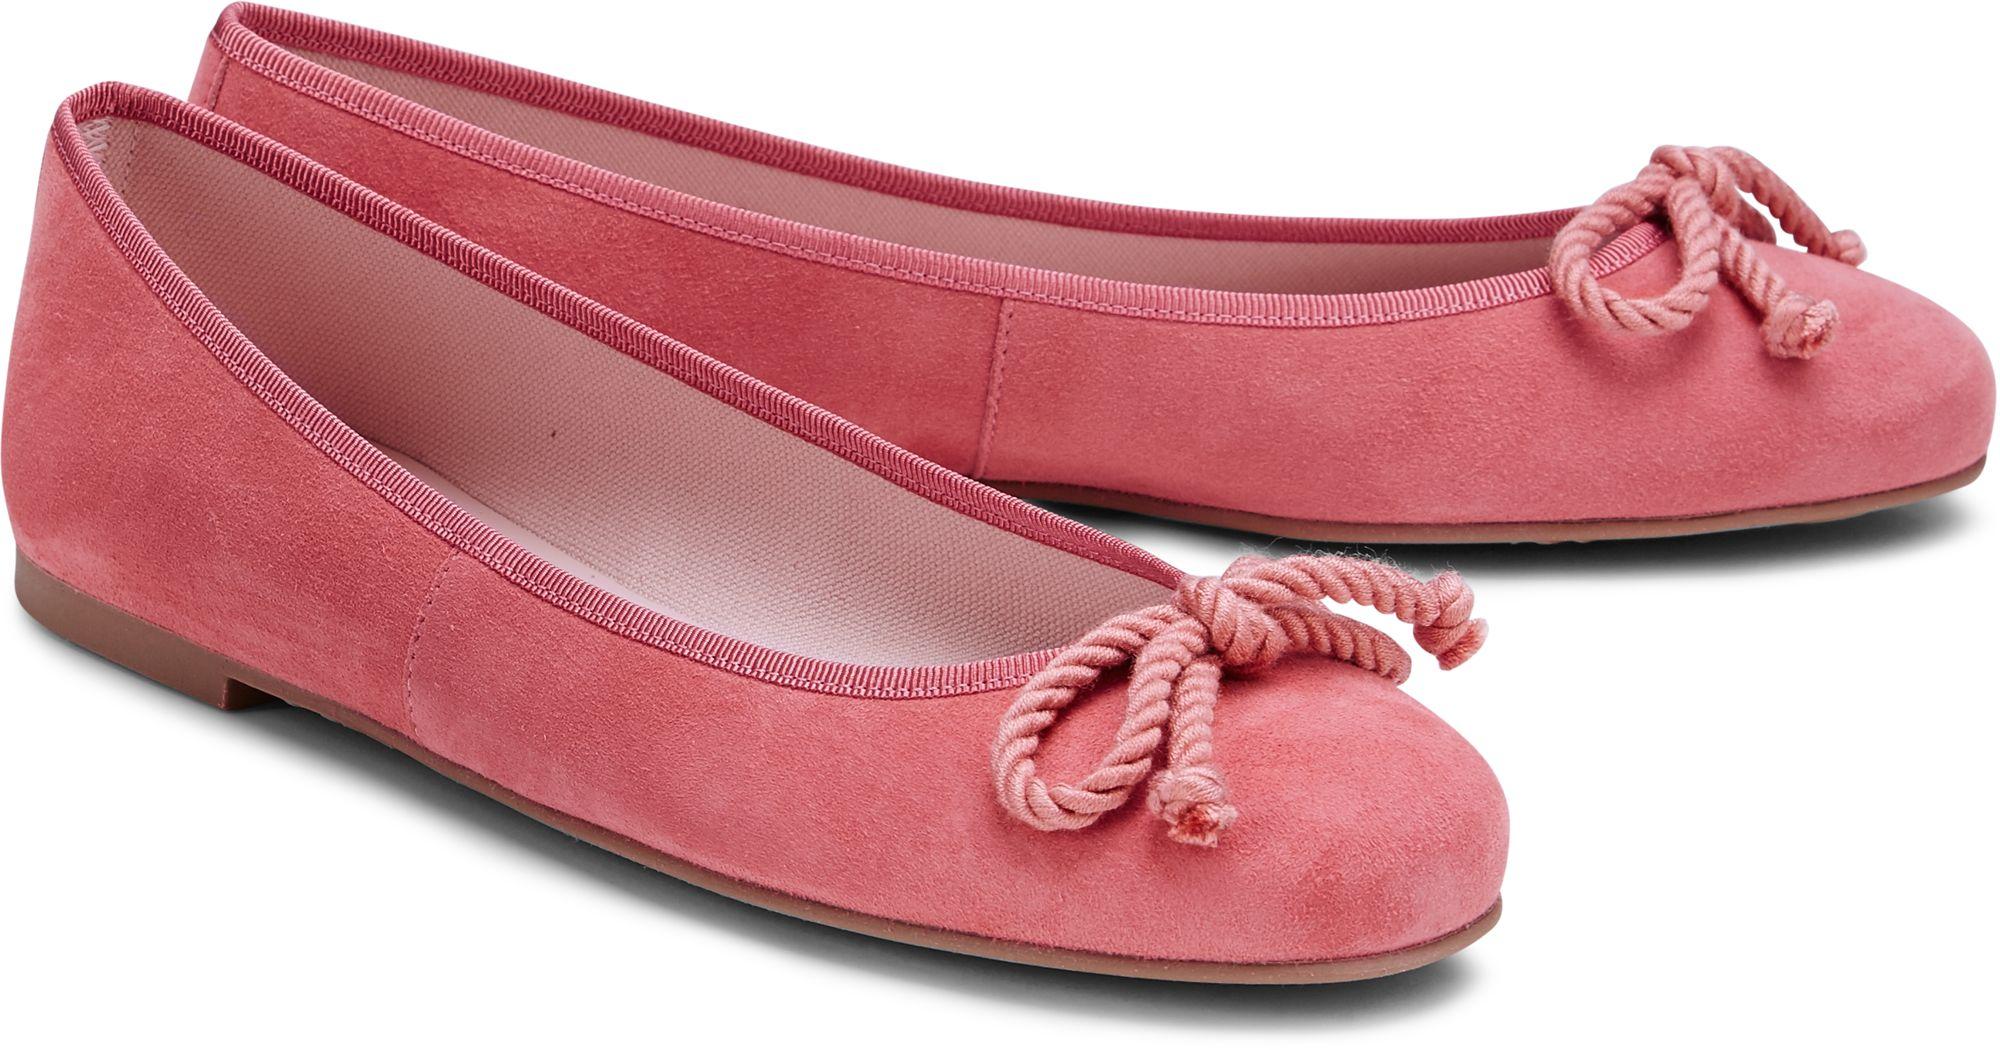 aa069b62aae91 Schuhe online kaufen